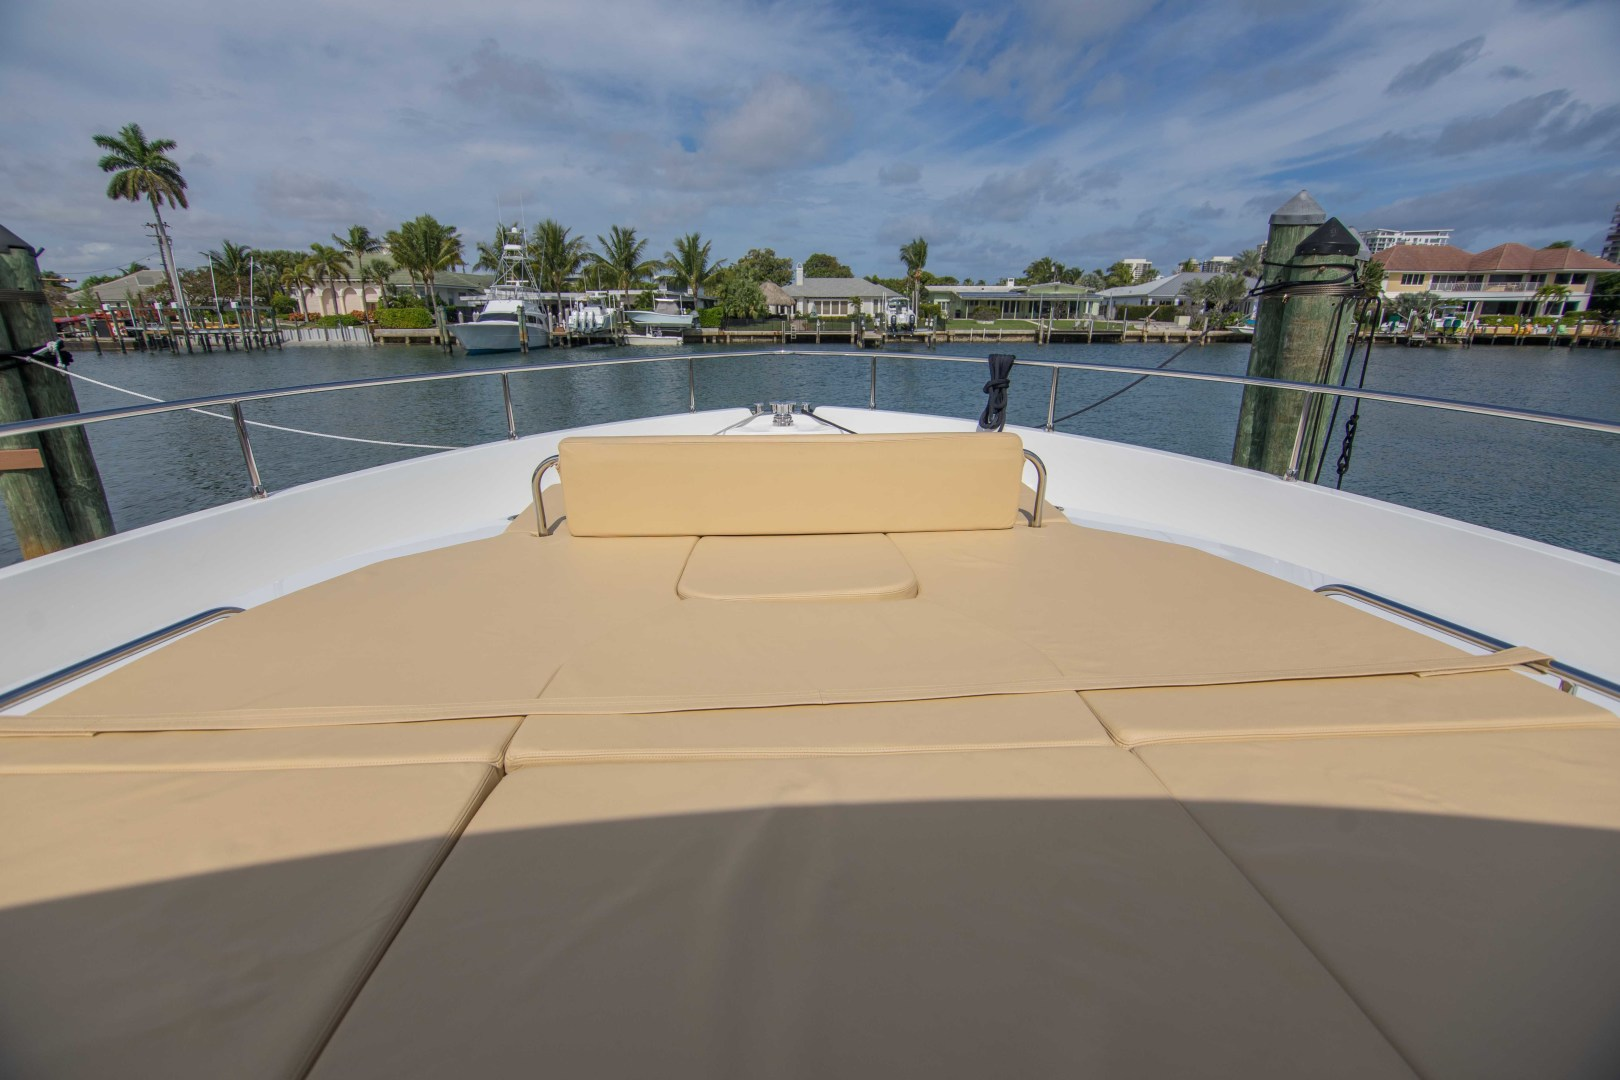 Sundeck-58 Sport 2019-LJ IV Singer Island-Florida-United States-Bow-1373097 | Thumbnail